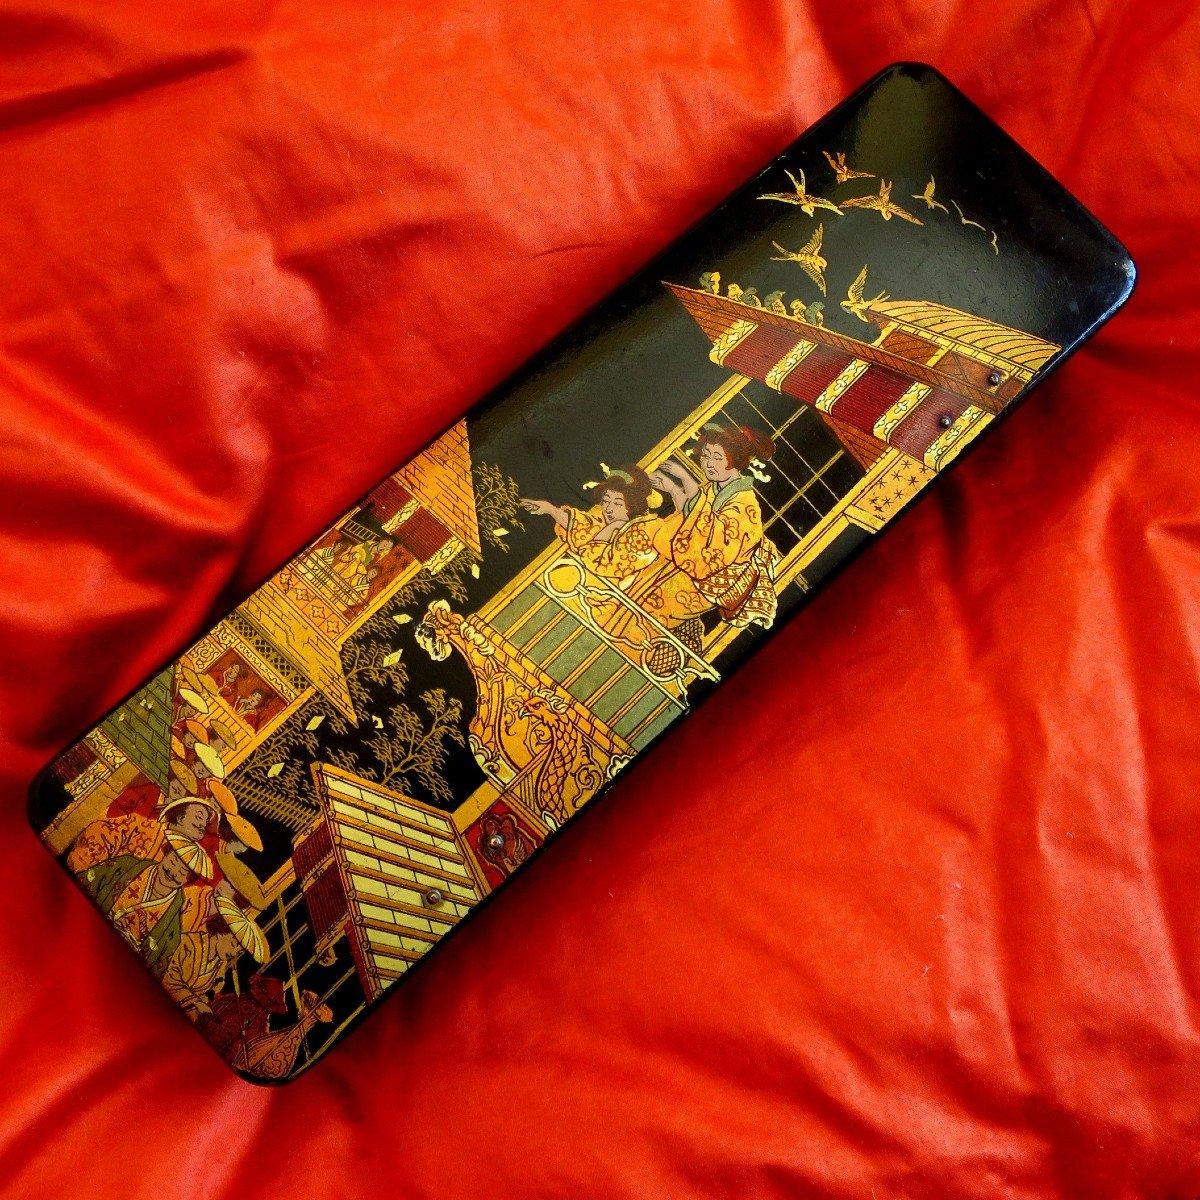 Napoleon III Glove Box With Chinese Decor In Boiled Cardboard